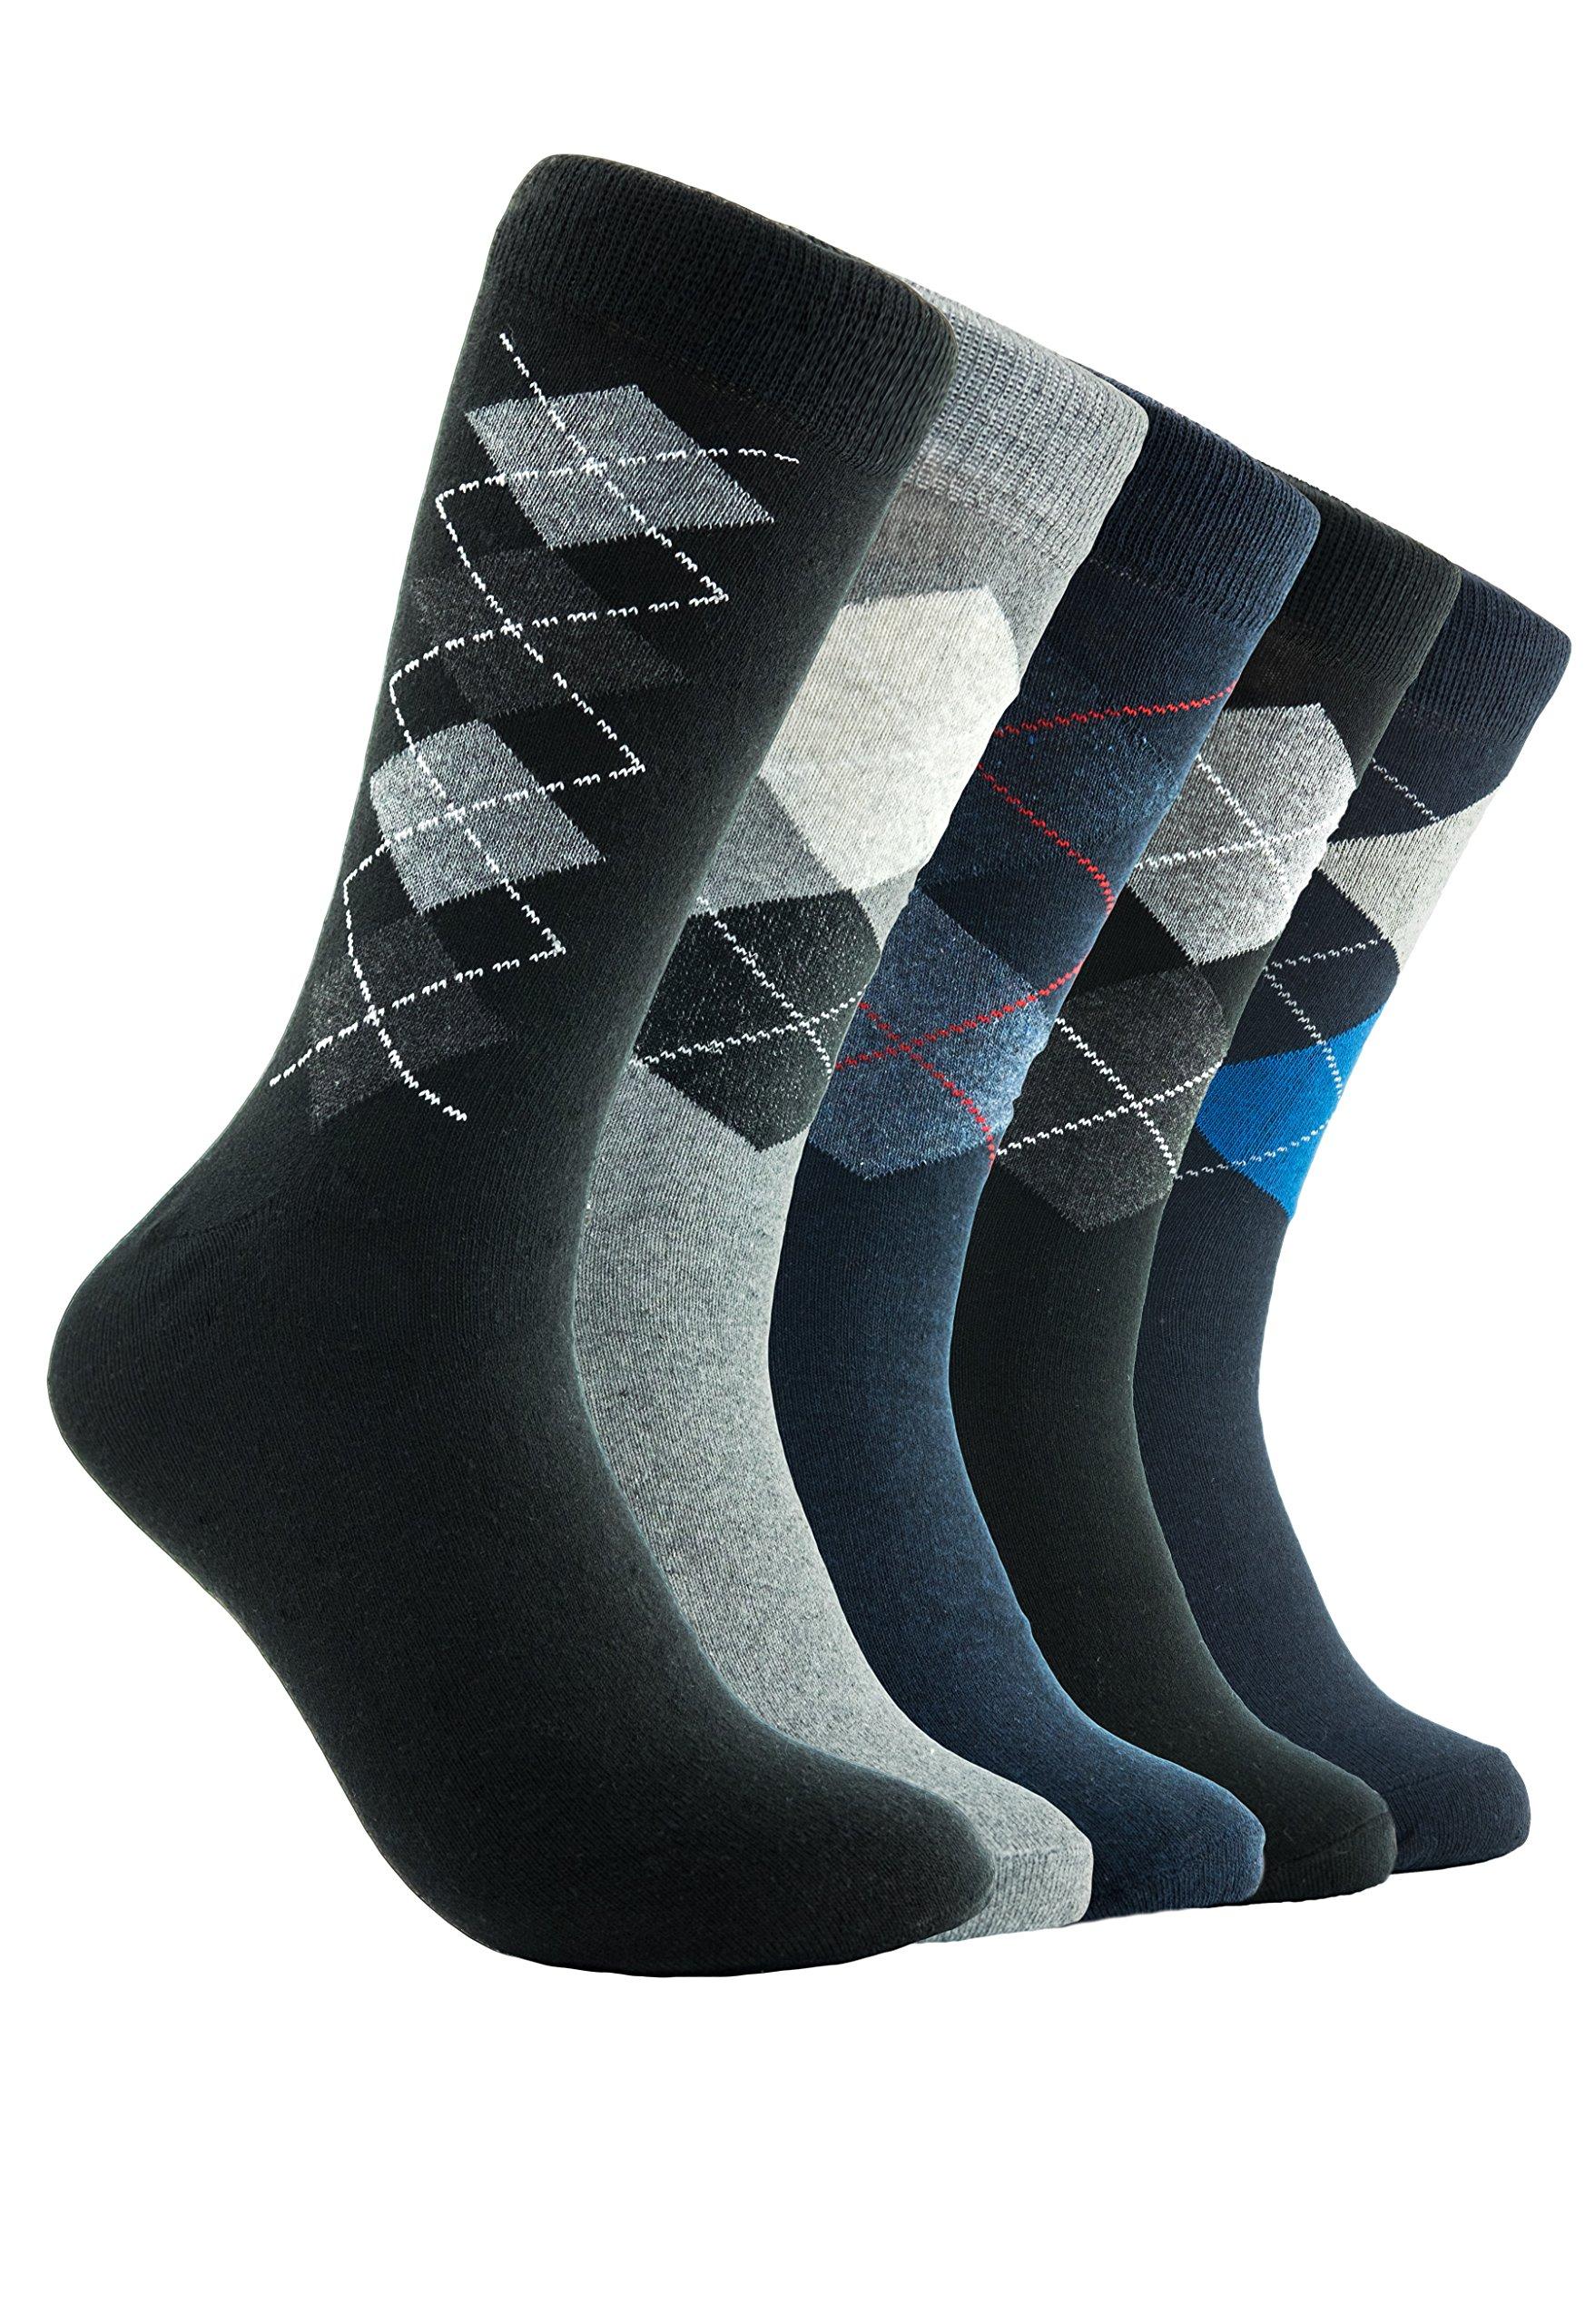 Mens Dress Socks 5 Pack Cotton Argyle Dress Socks Assorted Colors -5 Pair (10-13, Argyle) by Emprella